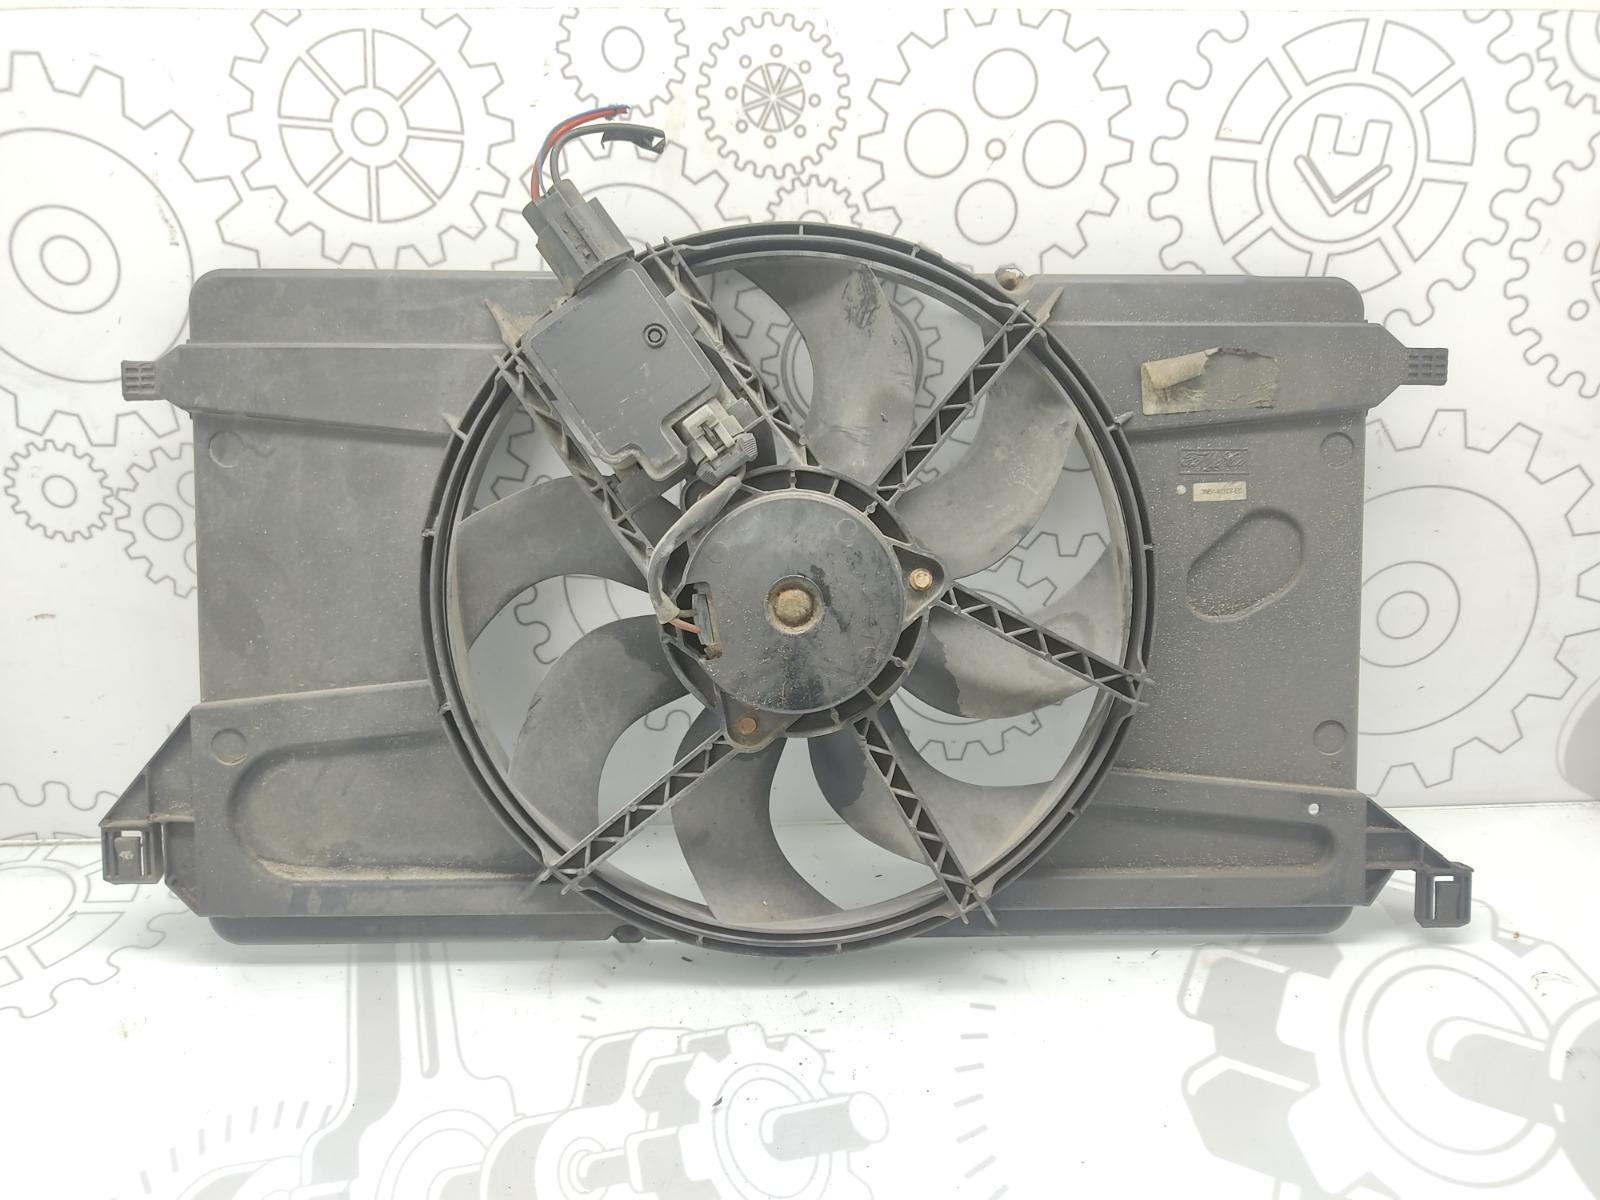 Вентилятор радиатора Ford Focus 1.6 I 2006 (б/у)